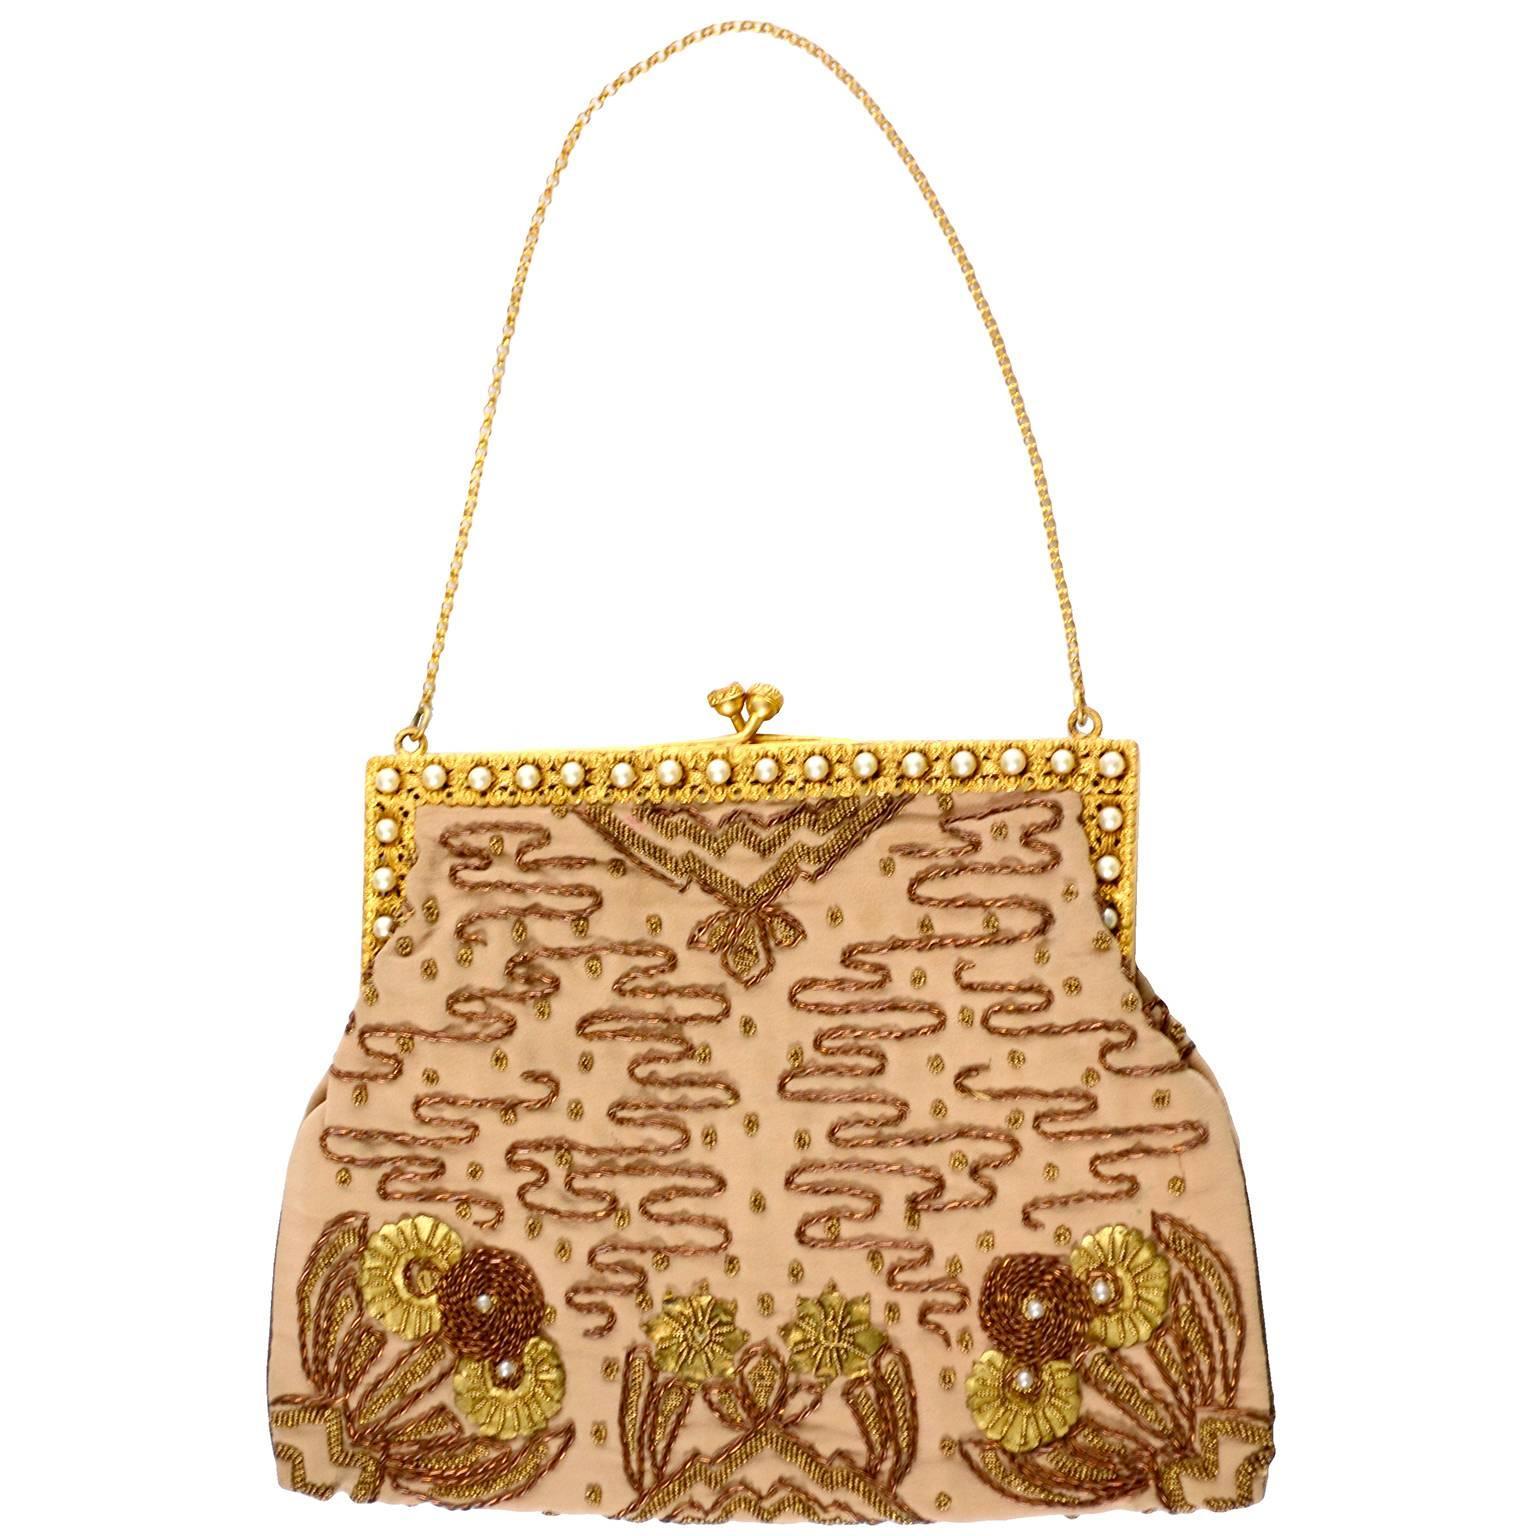 French Vintage Evening Bag Handbag Metallic Embroidery Beaded Pearls Gold Silk